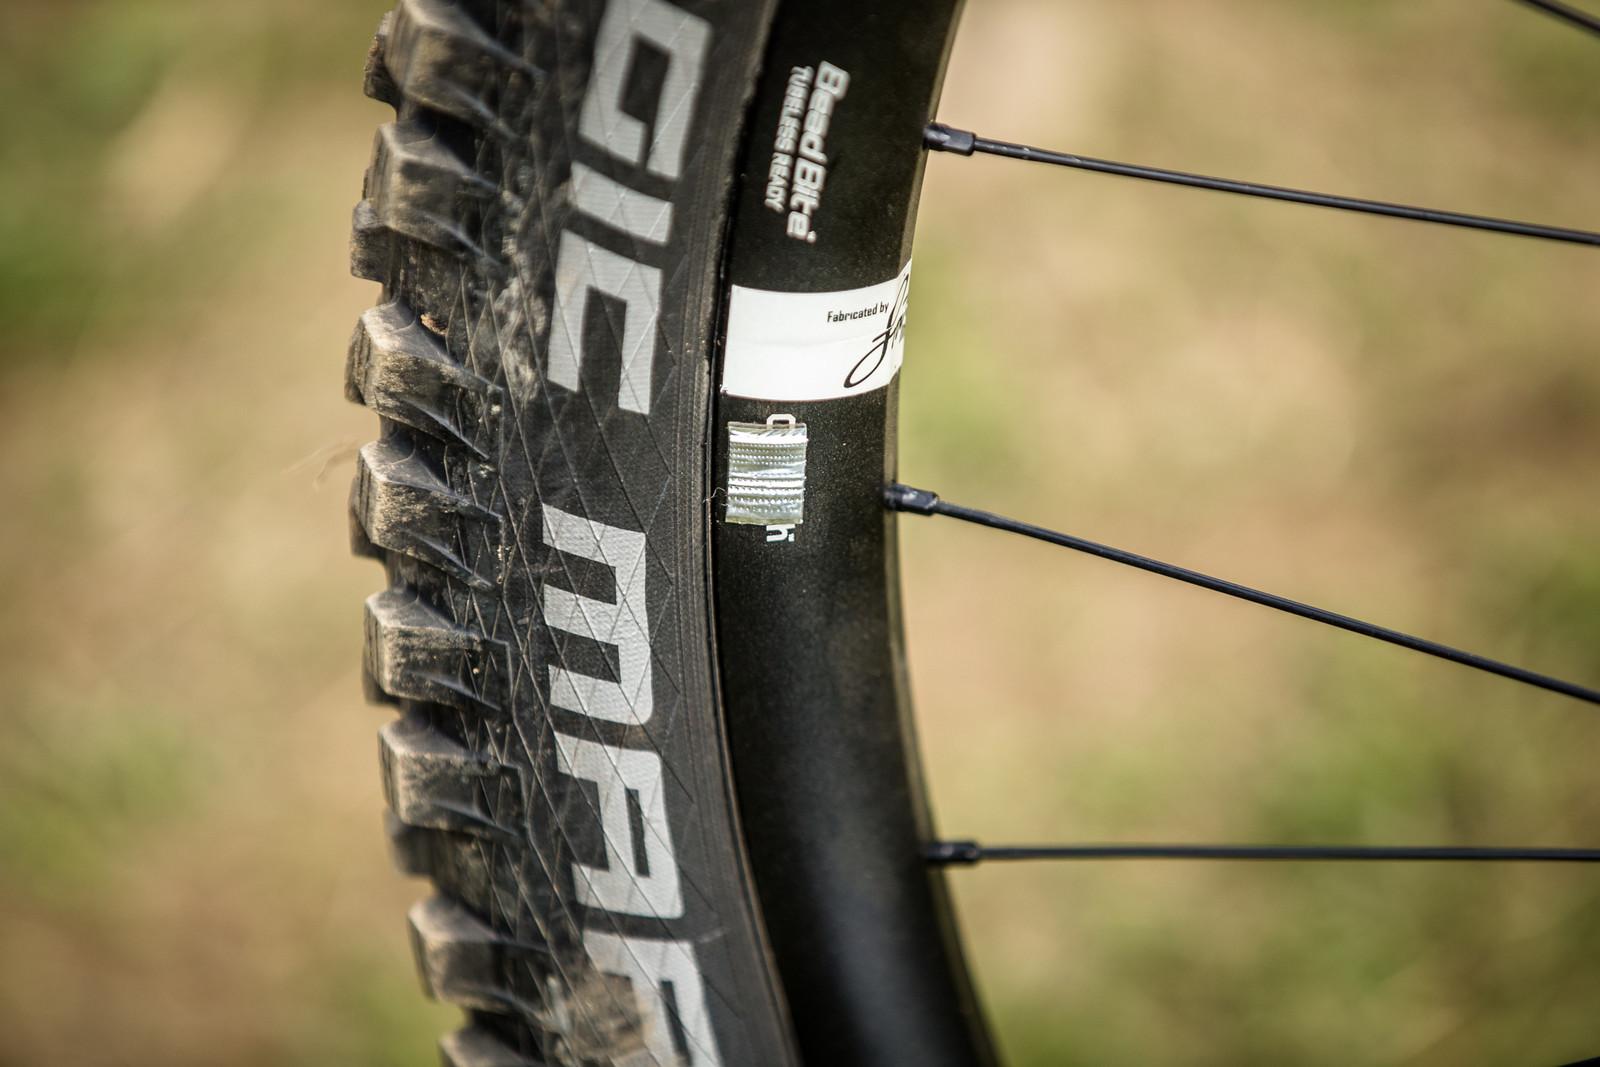 Wizard Stickers? - WINNING BIKE - Amaury Pierron's Commencal Supreme DH 29 - Mountain Biking Pictures - Vital MTB